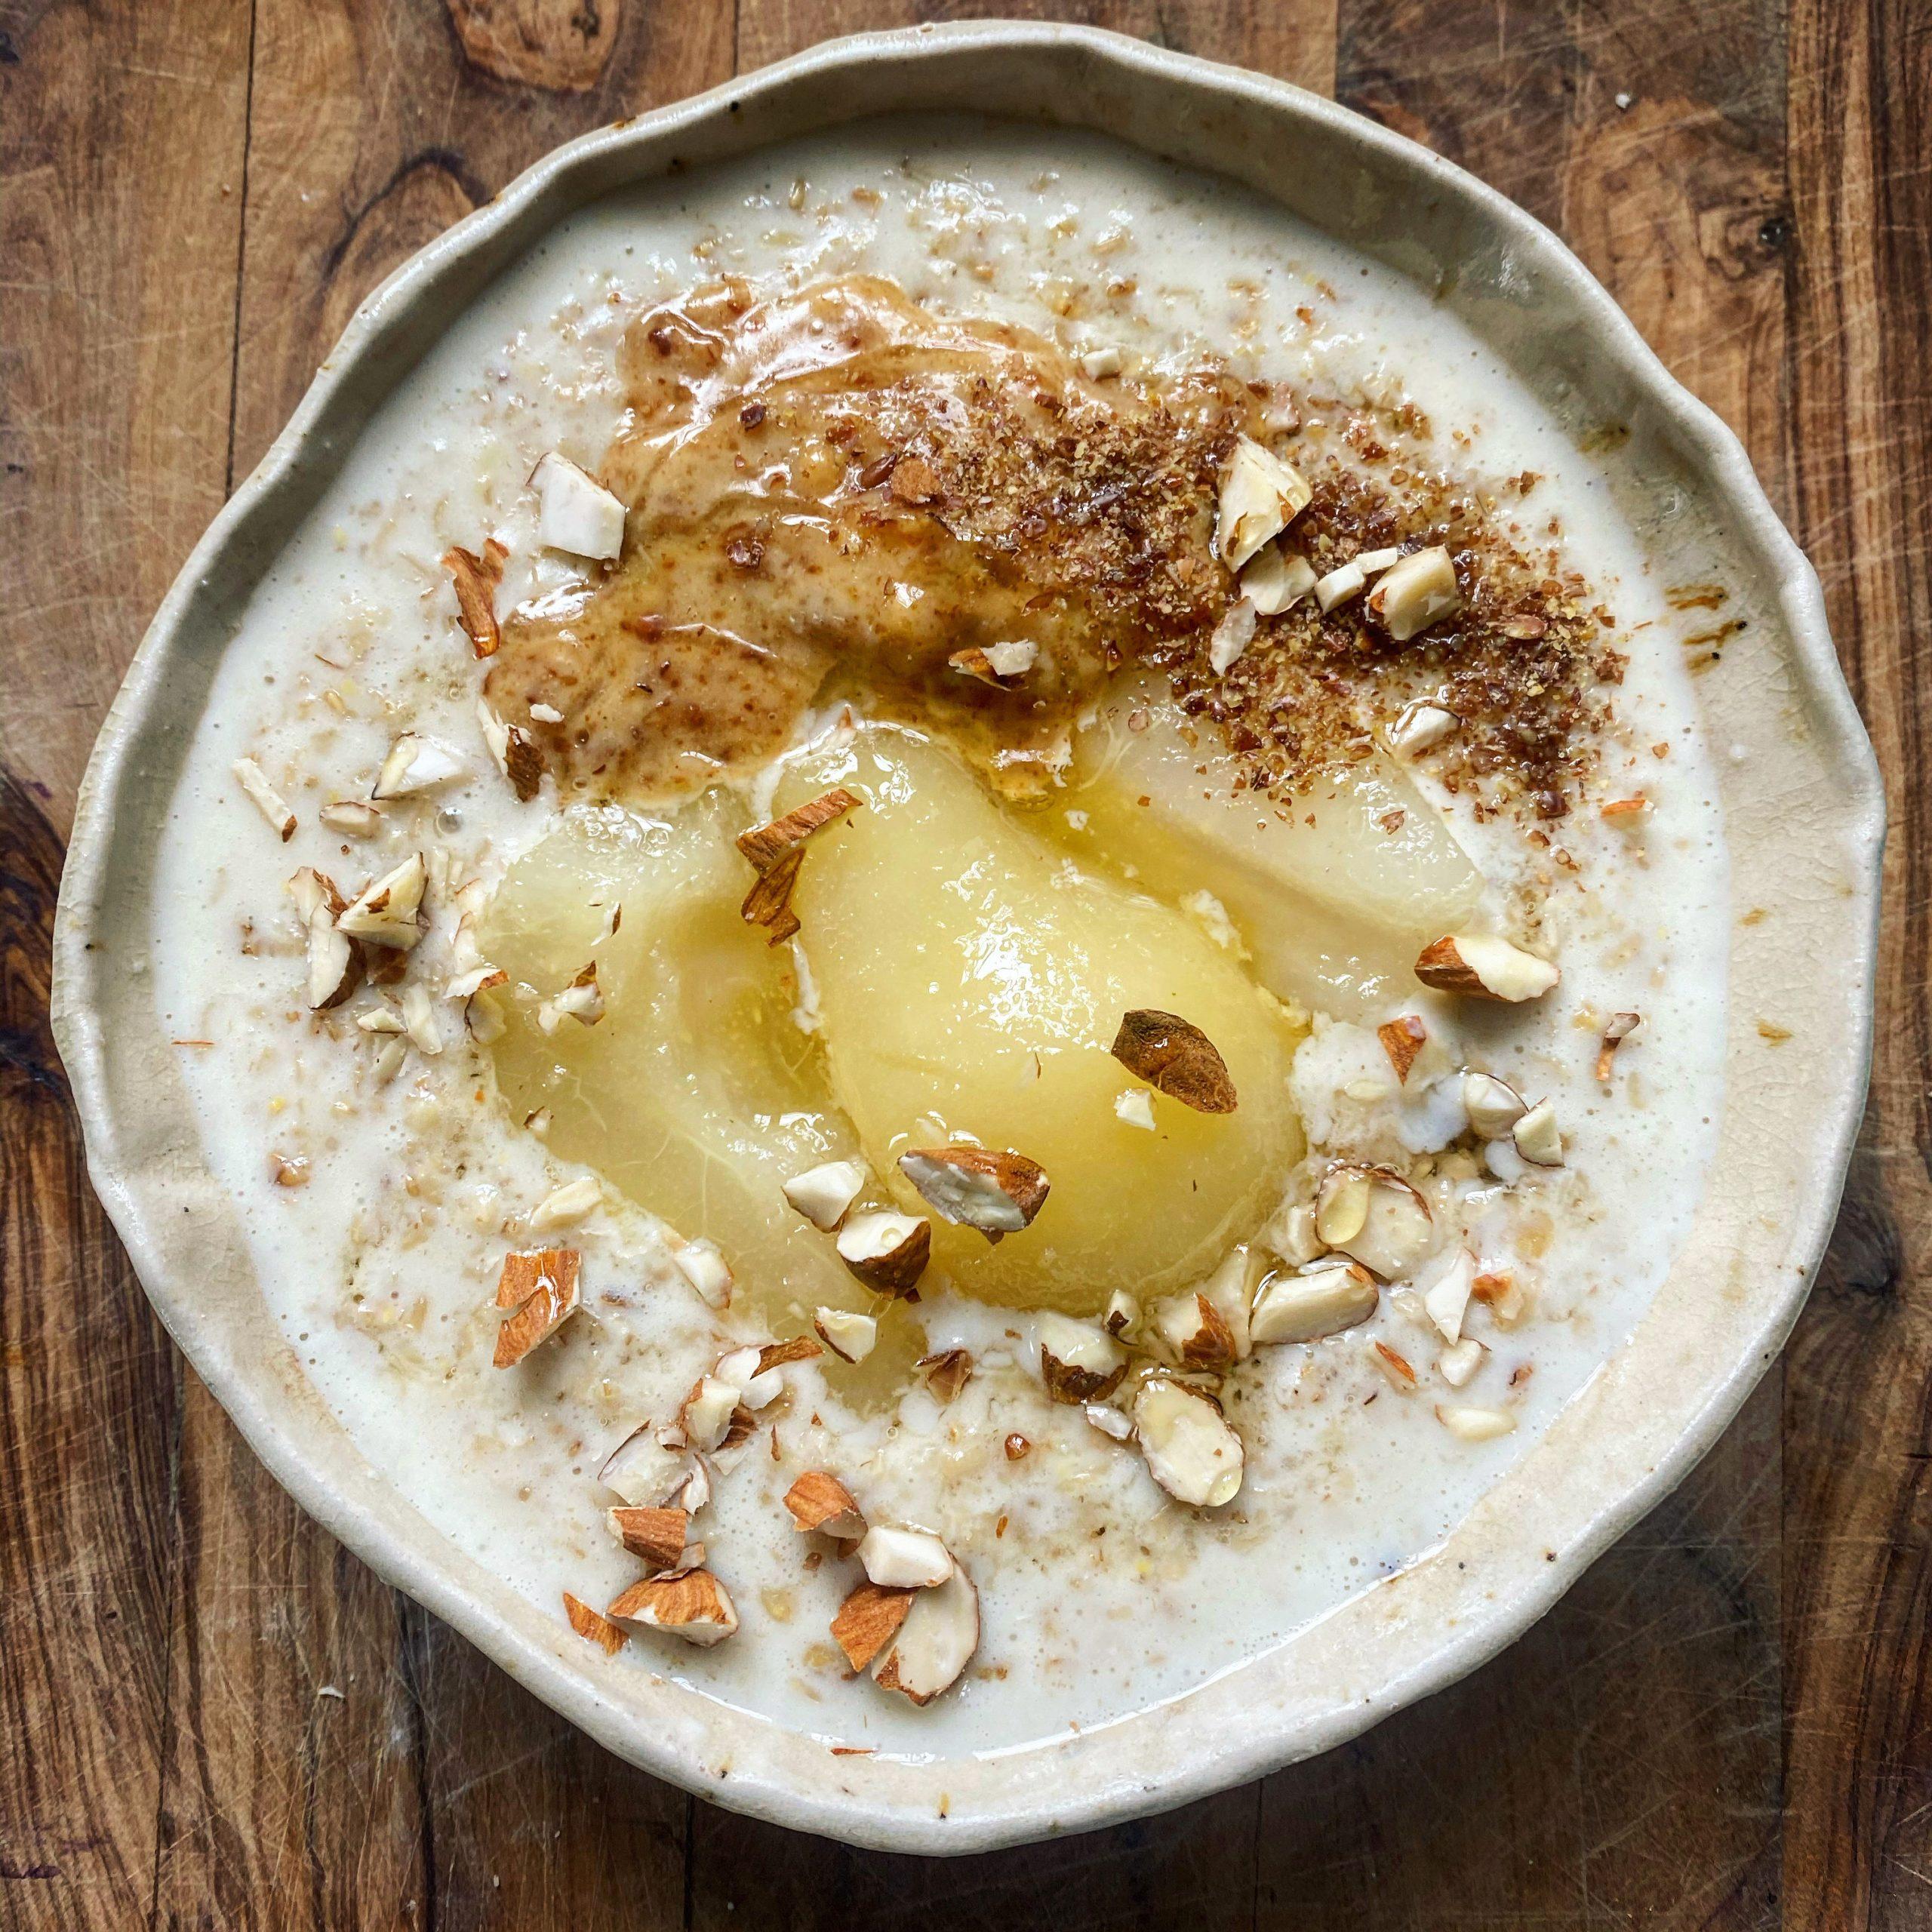 Peanut butter porridge recipe